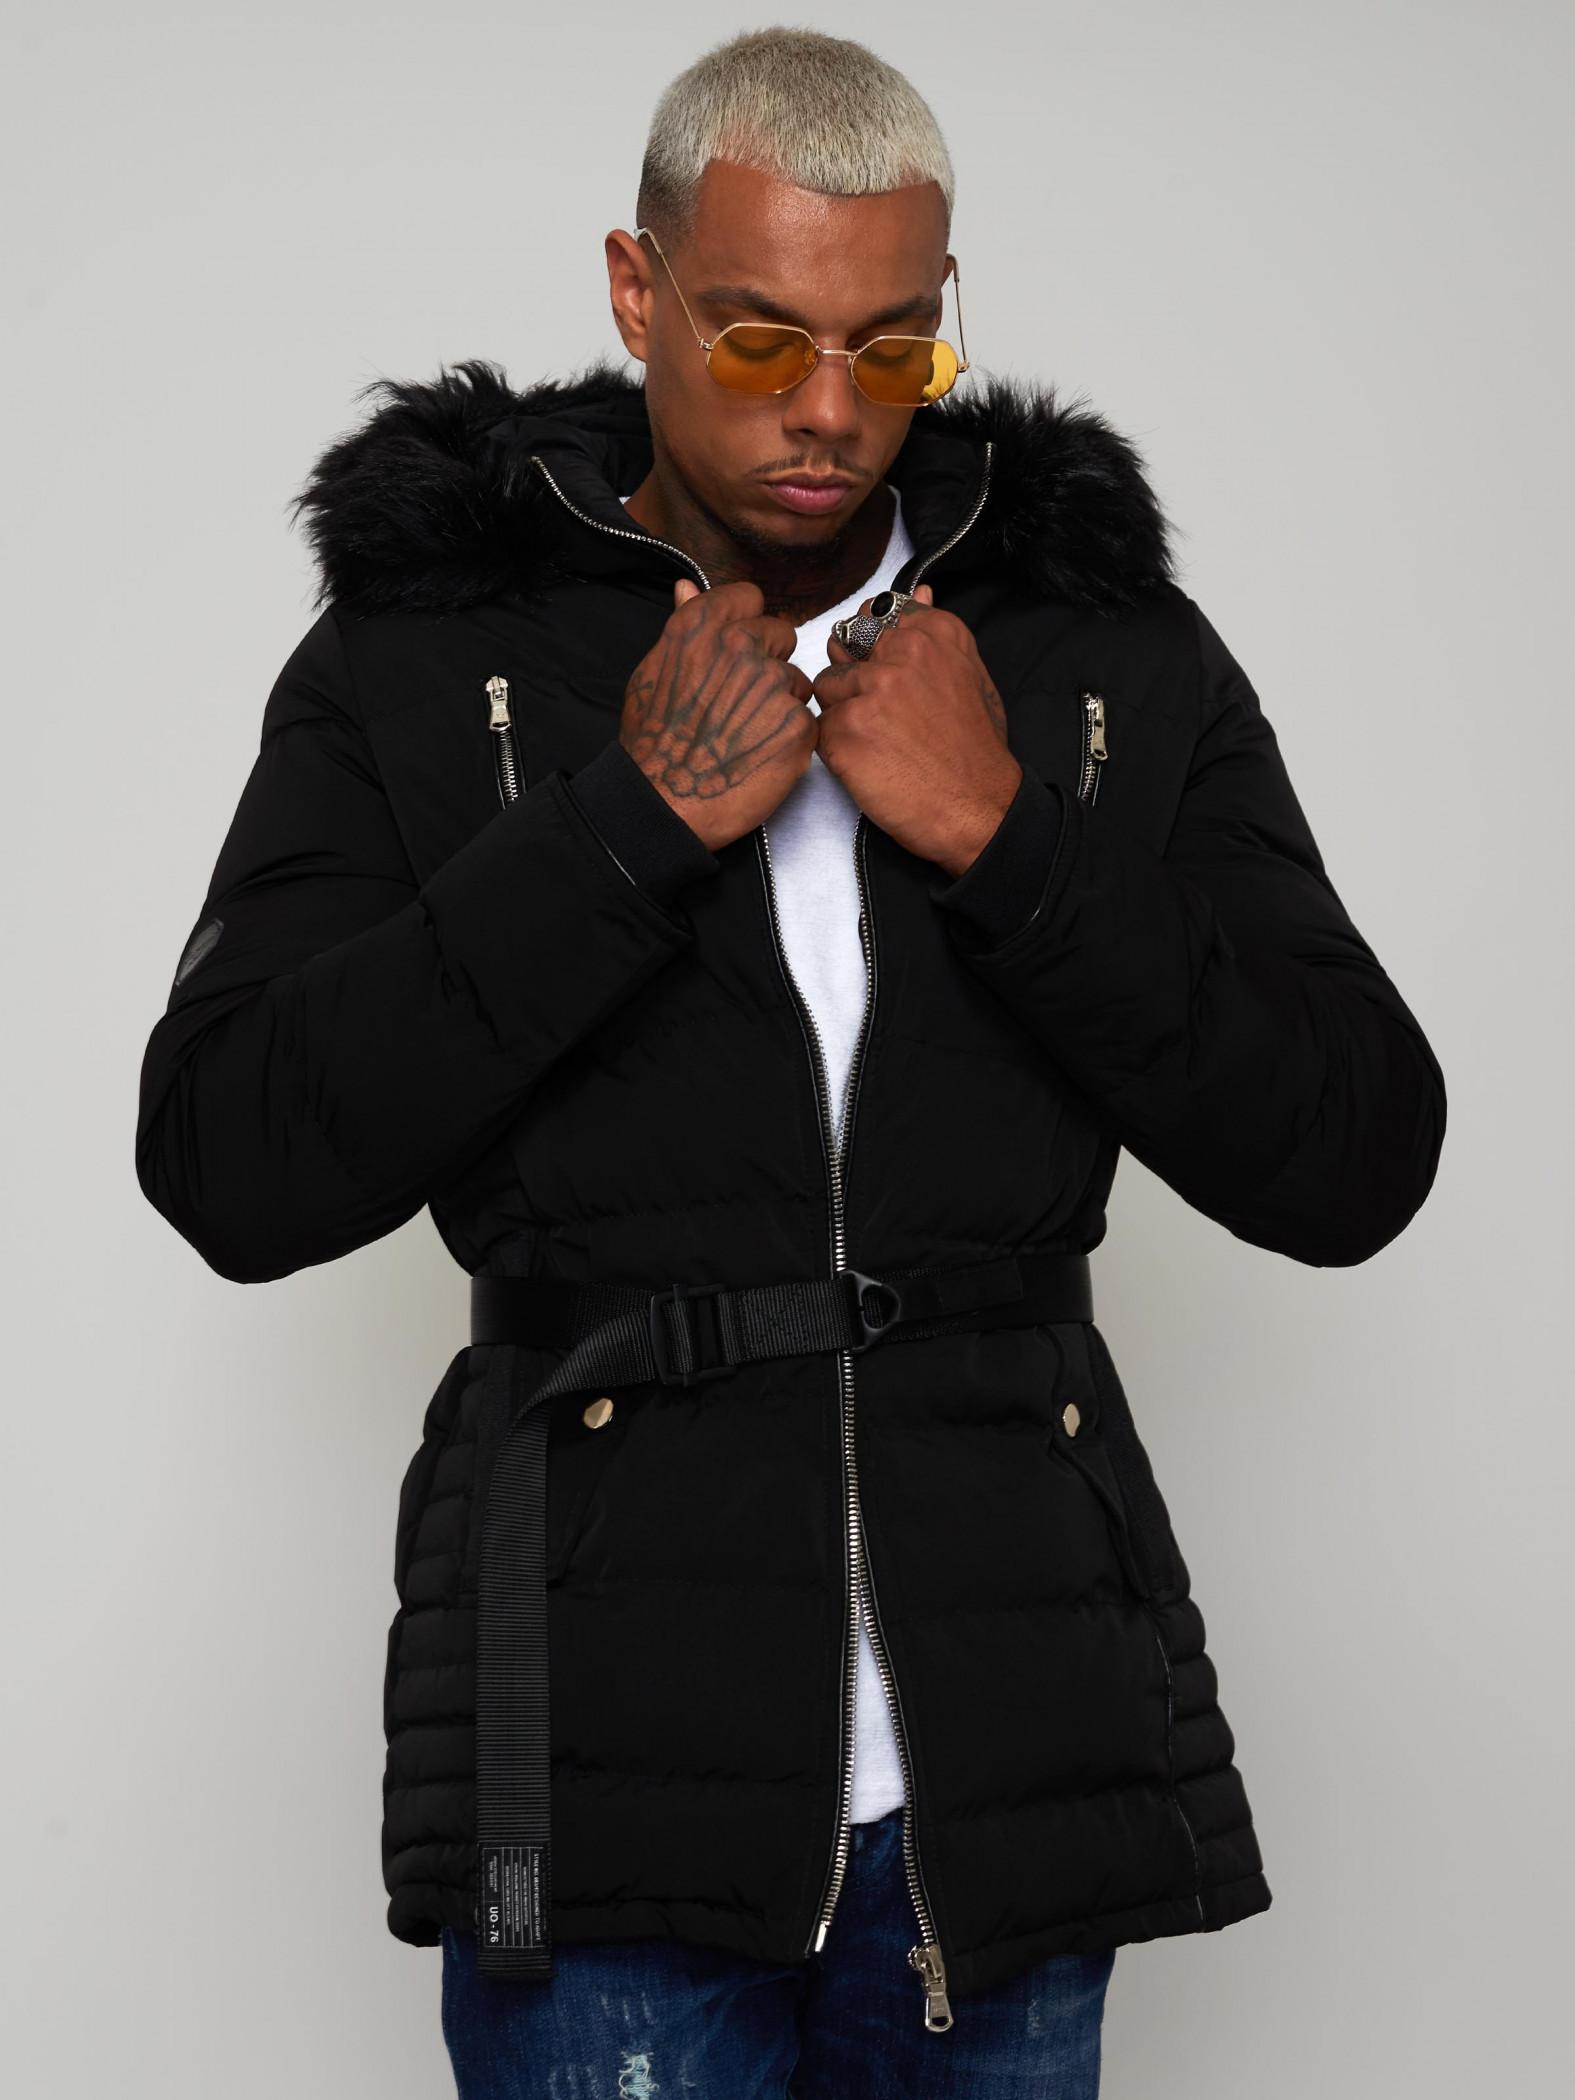 men 39 s coat with fur hood project x paris. Black Bedroom Furniture Sets. Home Design Ideas